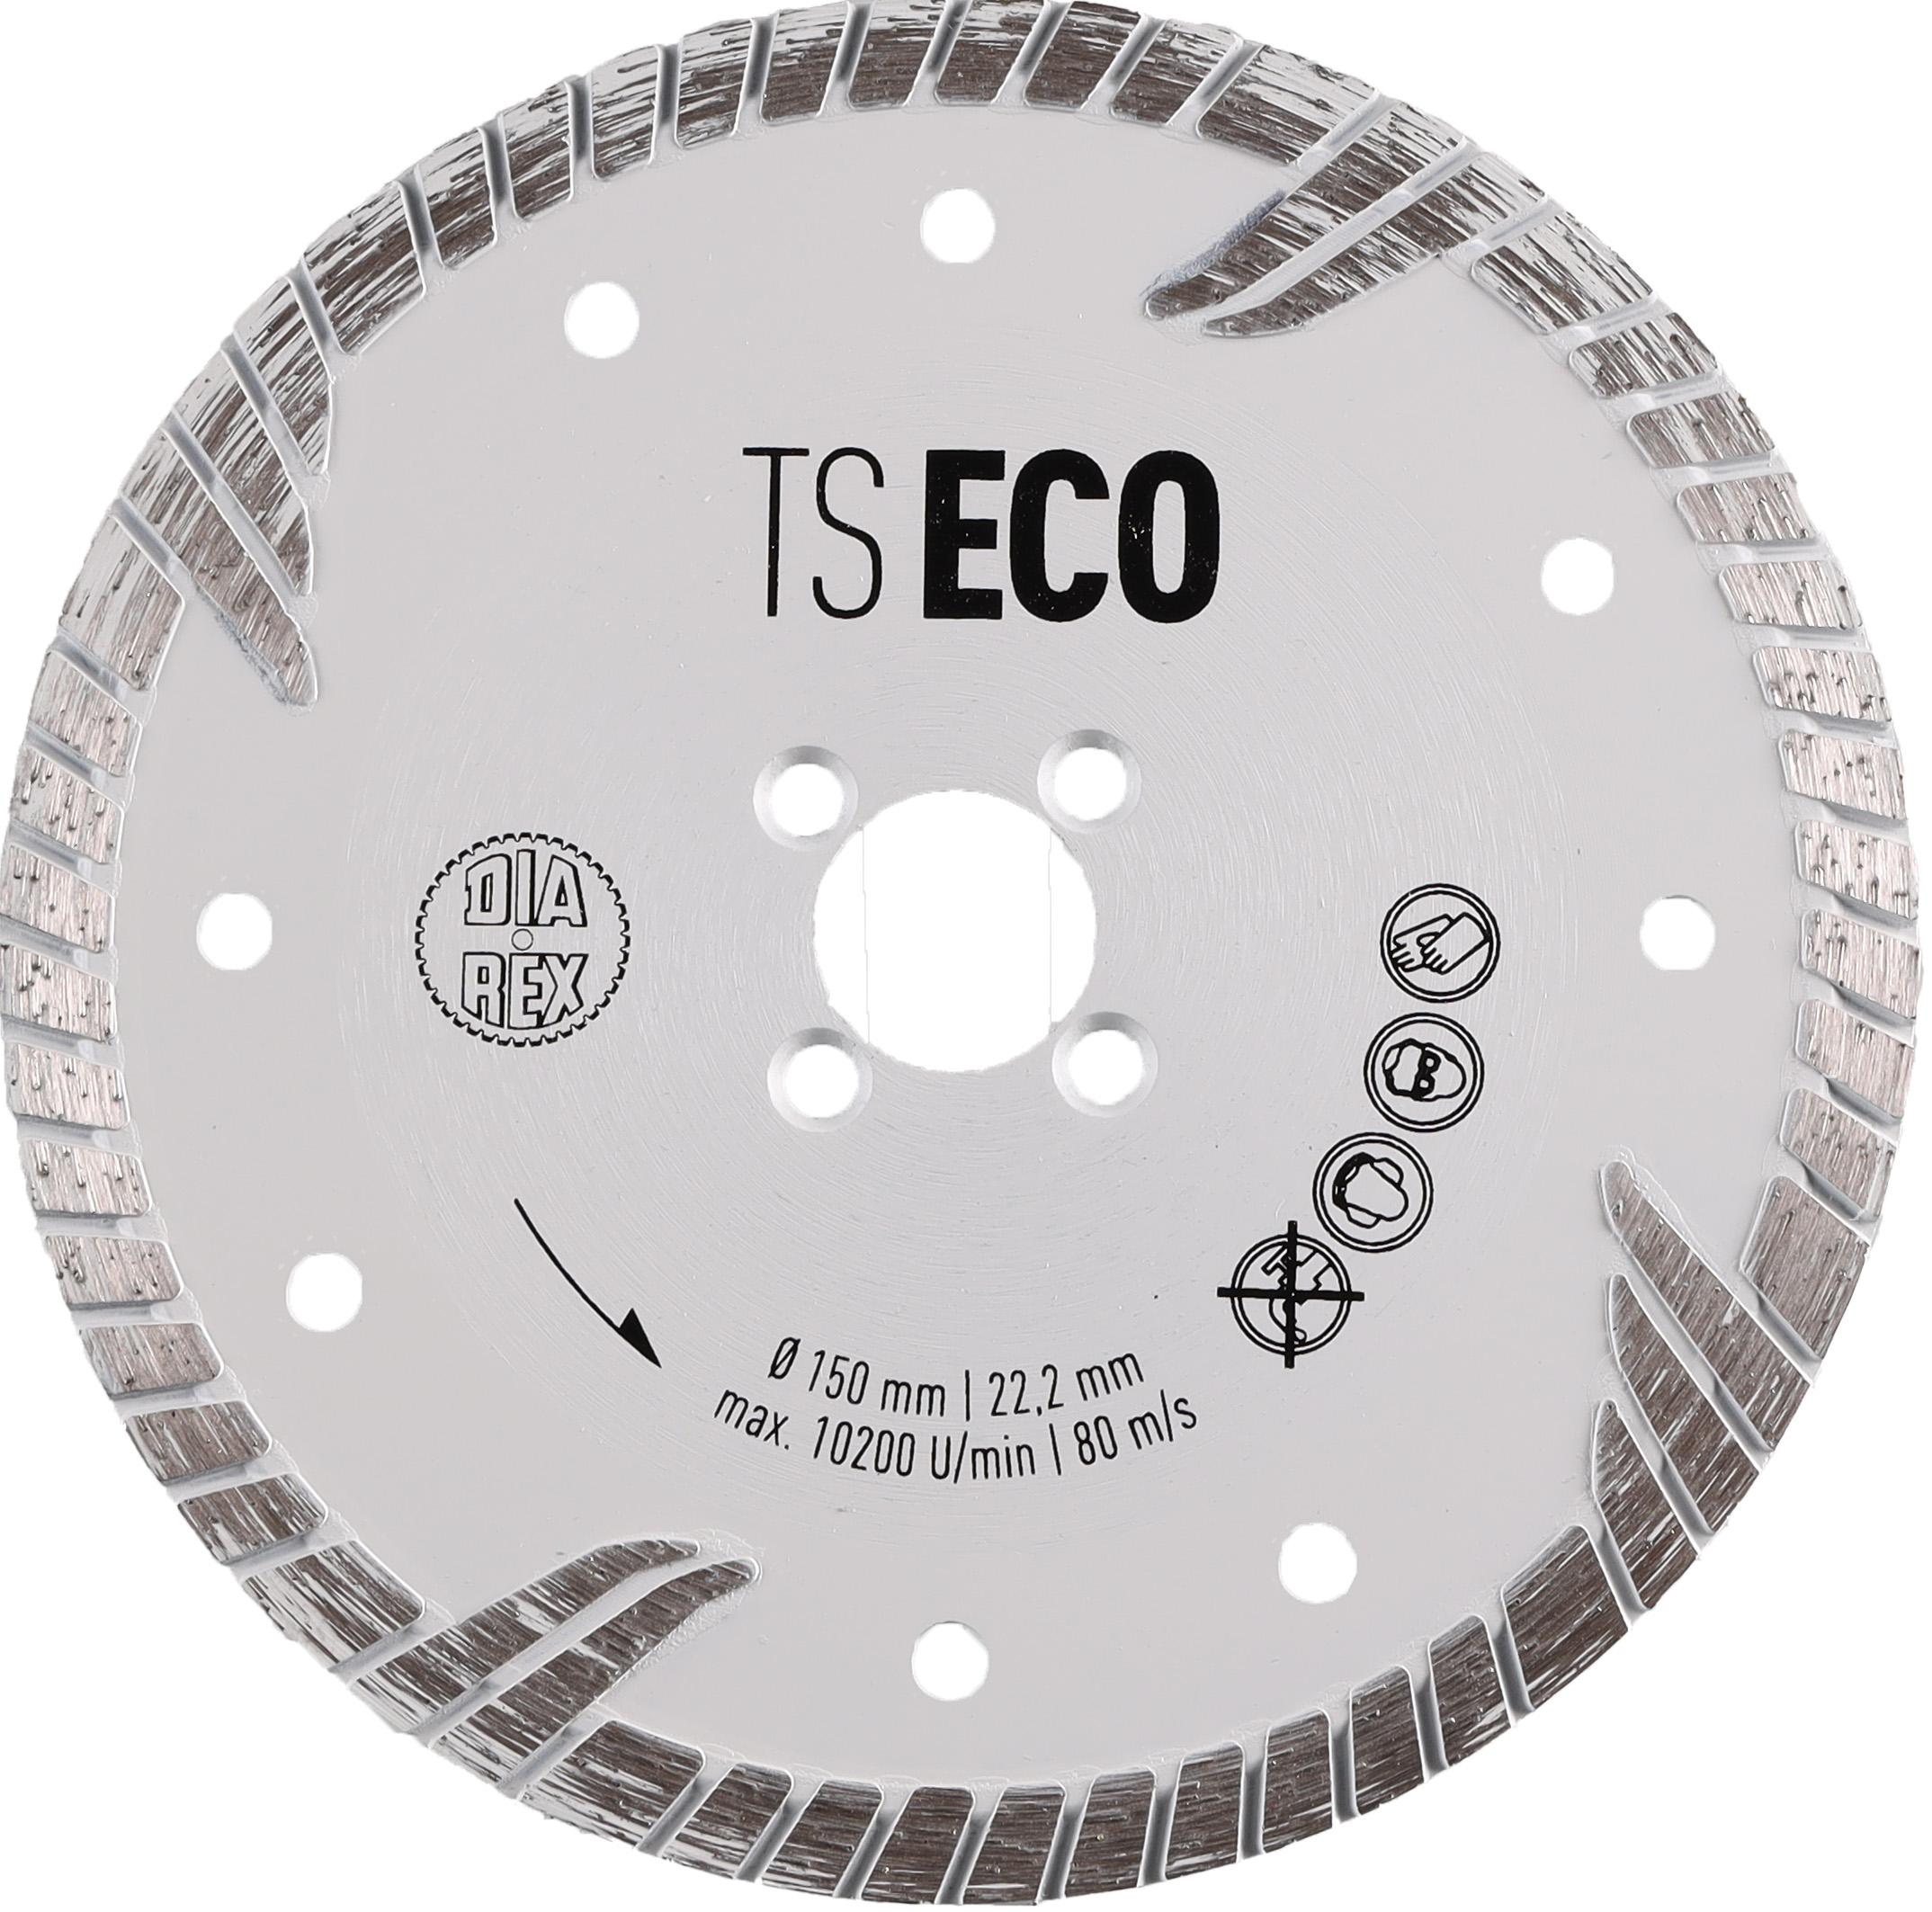 DIAREX Trennscheibe ECO ø 150 mm